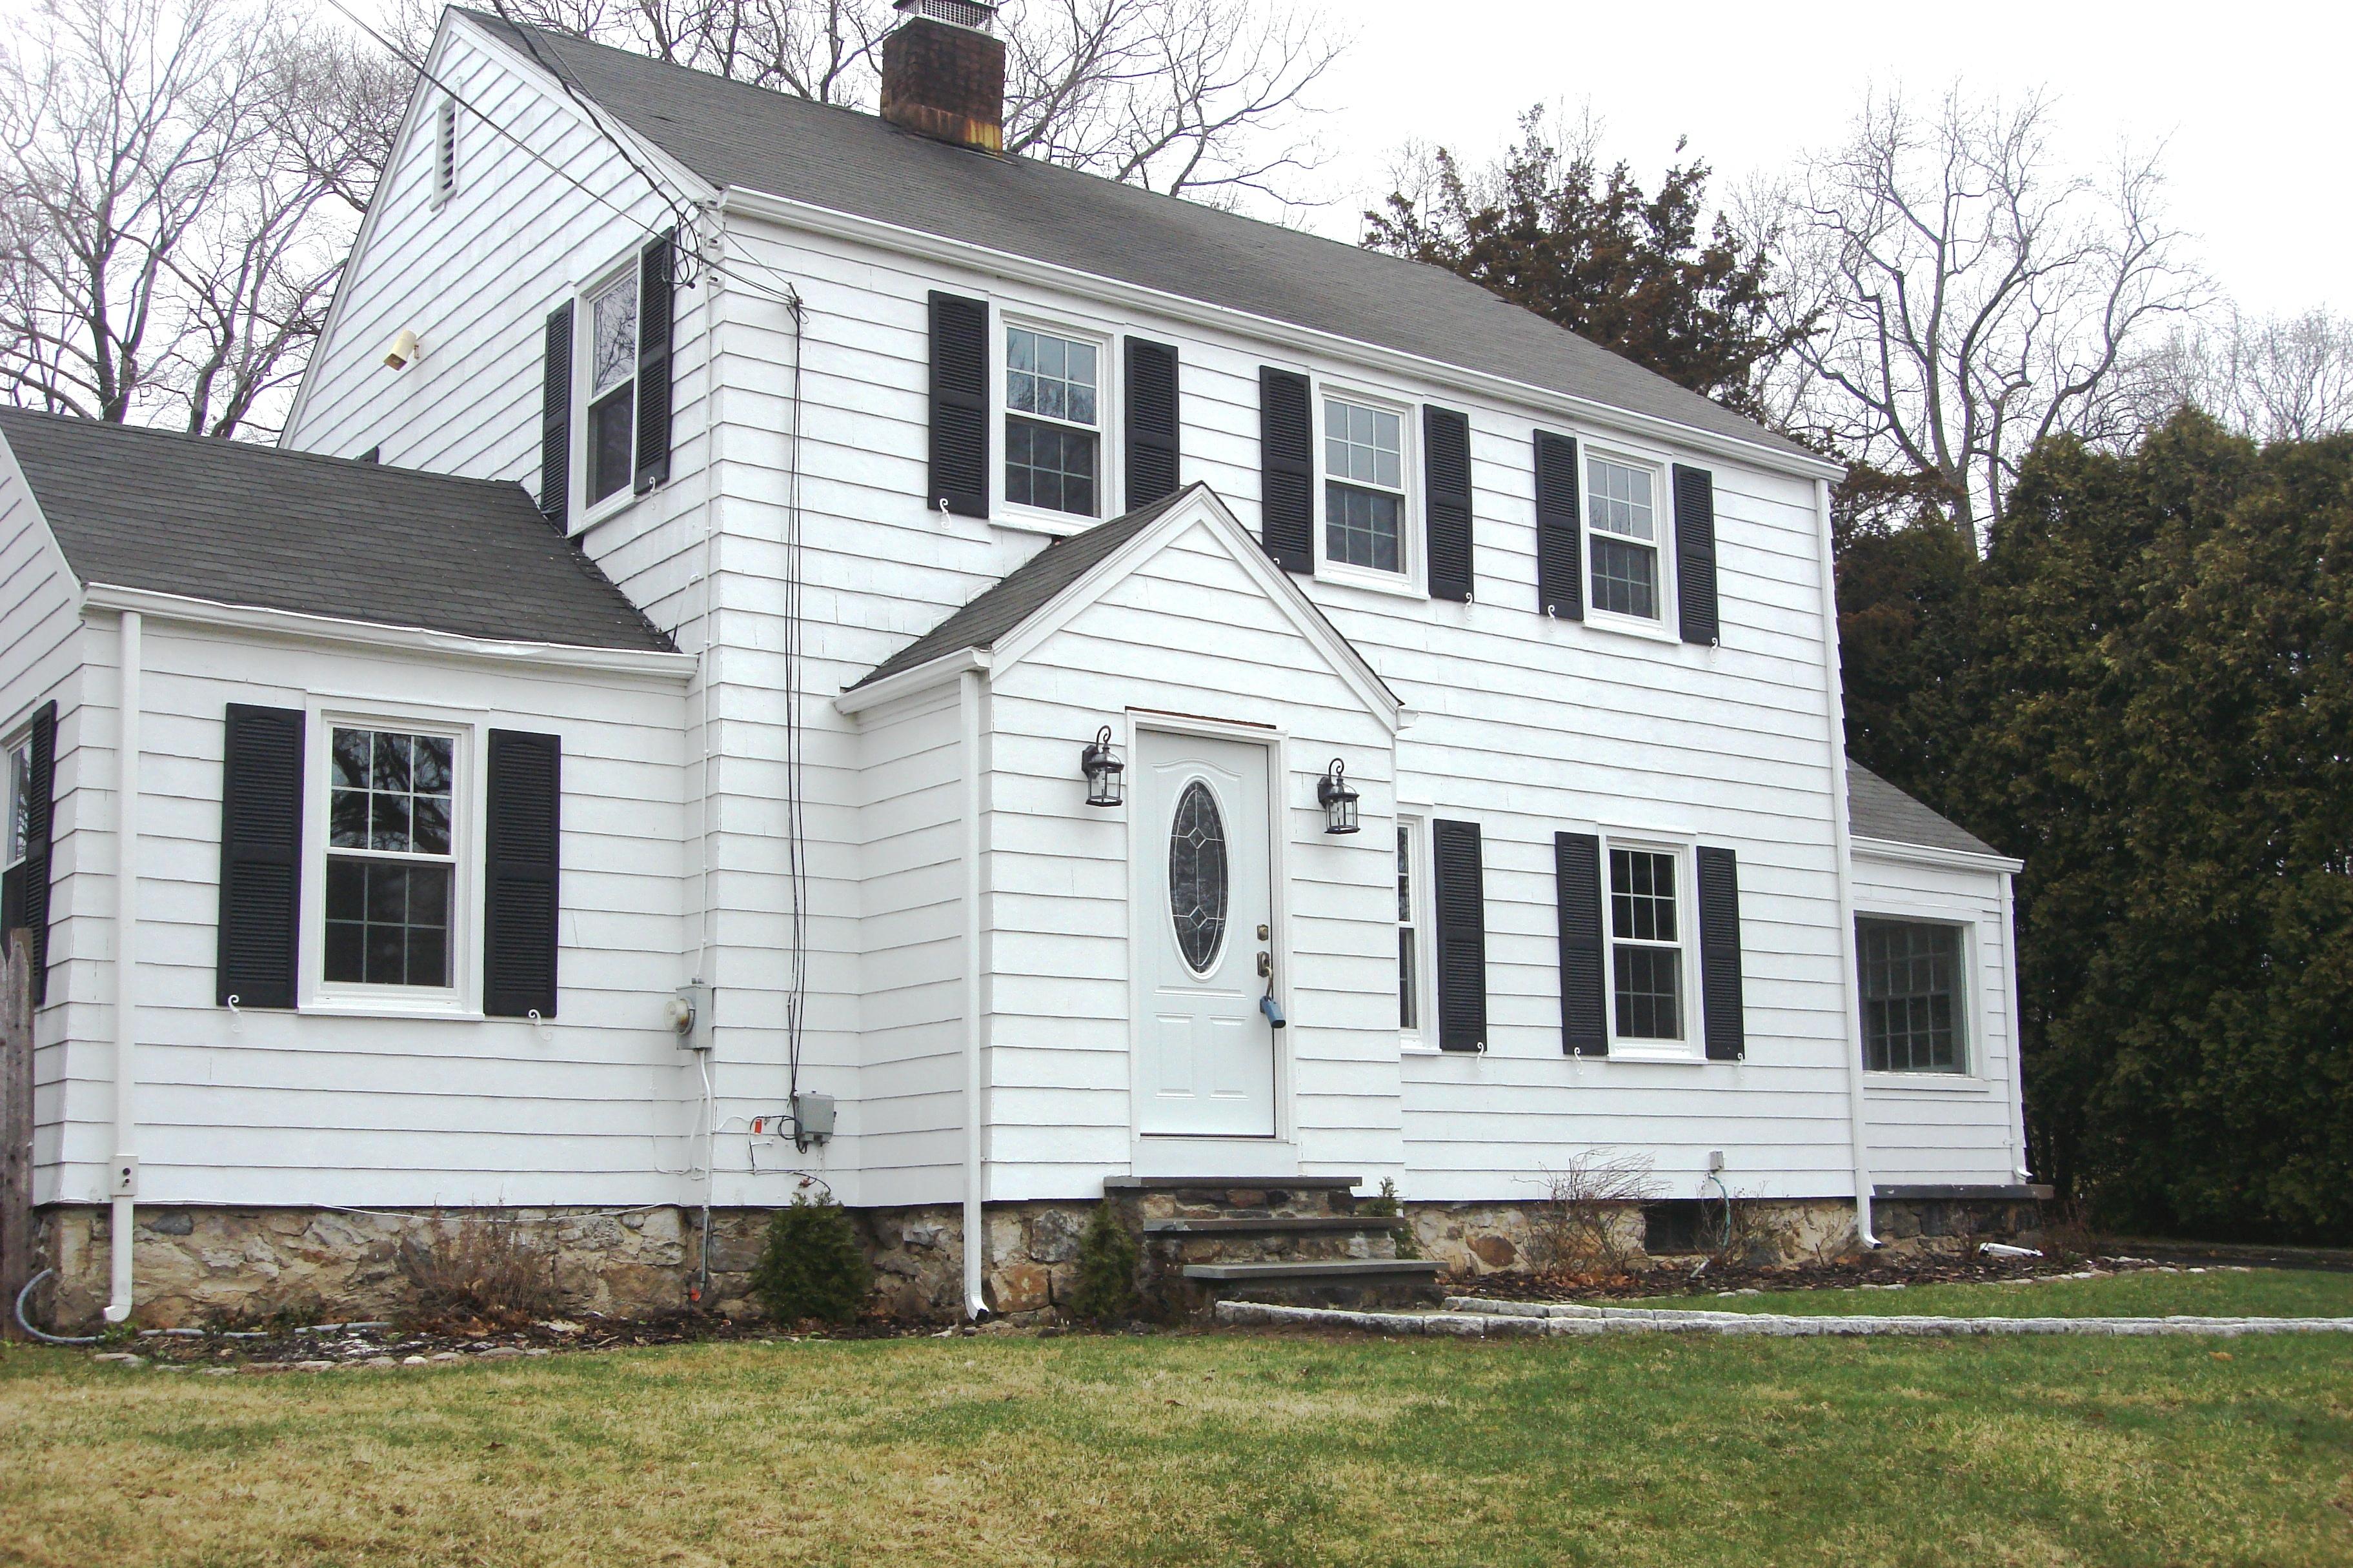 獨棟家庭住宅 為 出售 在 Remodeled for Today's Living 139 Richards Avenue Norwalk, 康涅狄格州 06854 美國